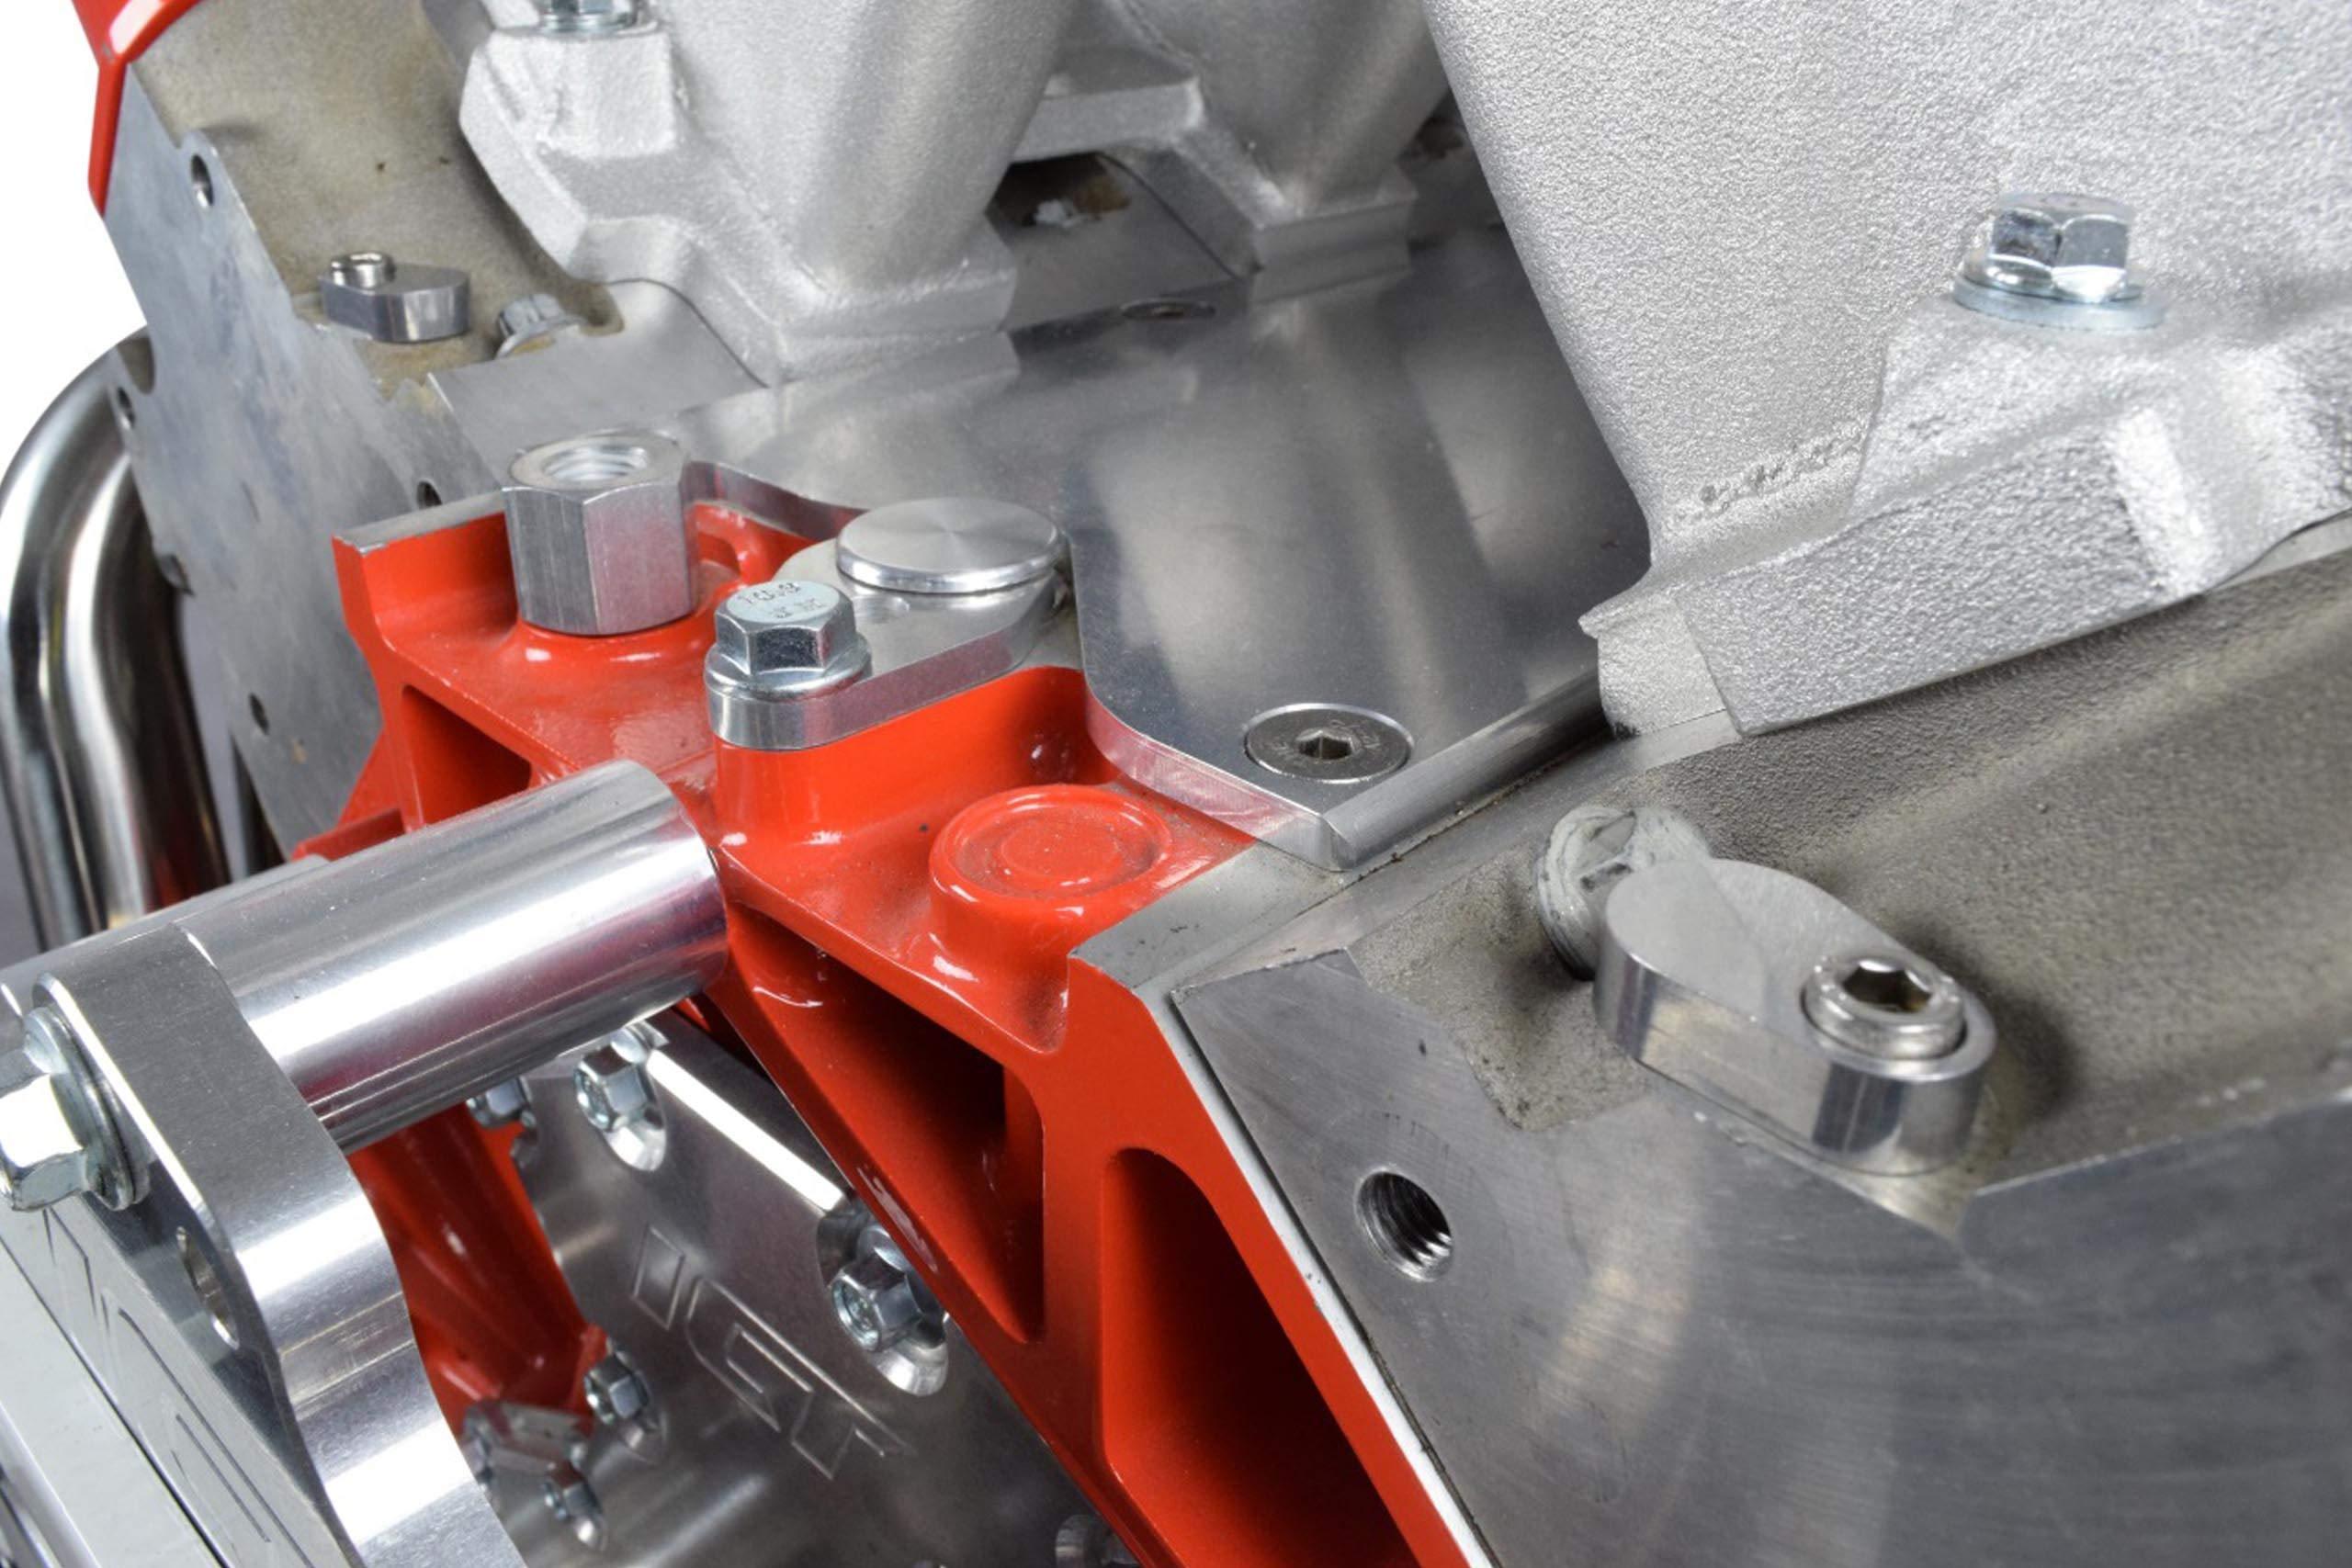 For LS Engine 3-Bolt DBC DBW Gen 3 Throttle Body Bypass Steel Braided Hose Kit Coolant Crossover Steam Tube Compatible with LSX LS1 LM7 LR4 LQ4 LS6 L59 LQ9 LM4 L33 551694H